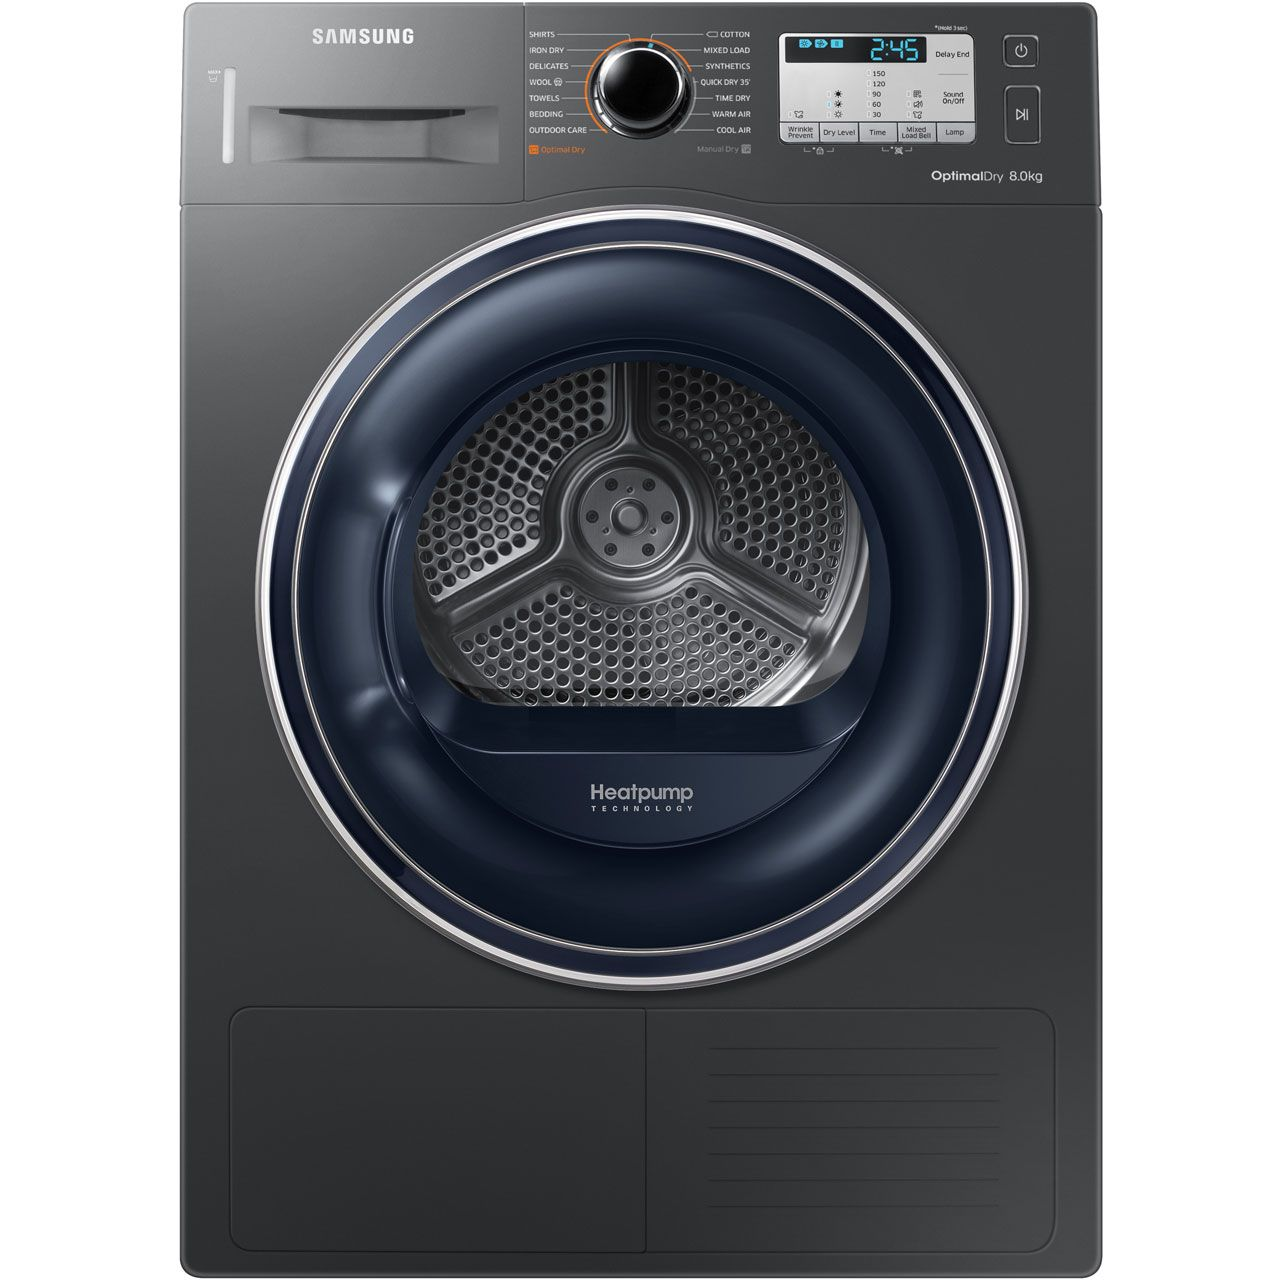 Samsung Dv80m50133x 8kg Heat Pump Tumble Dryer Graphite A Rated Heat Pump Tumble Dryers Washer Dryer Shelf